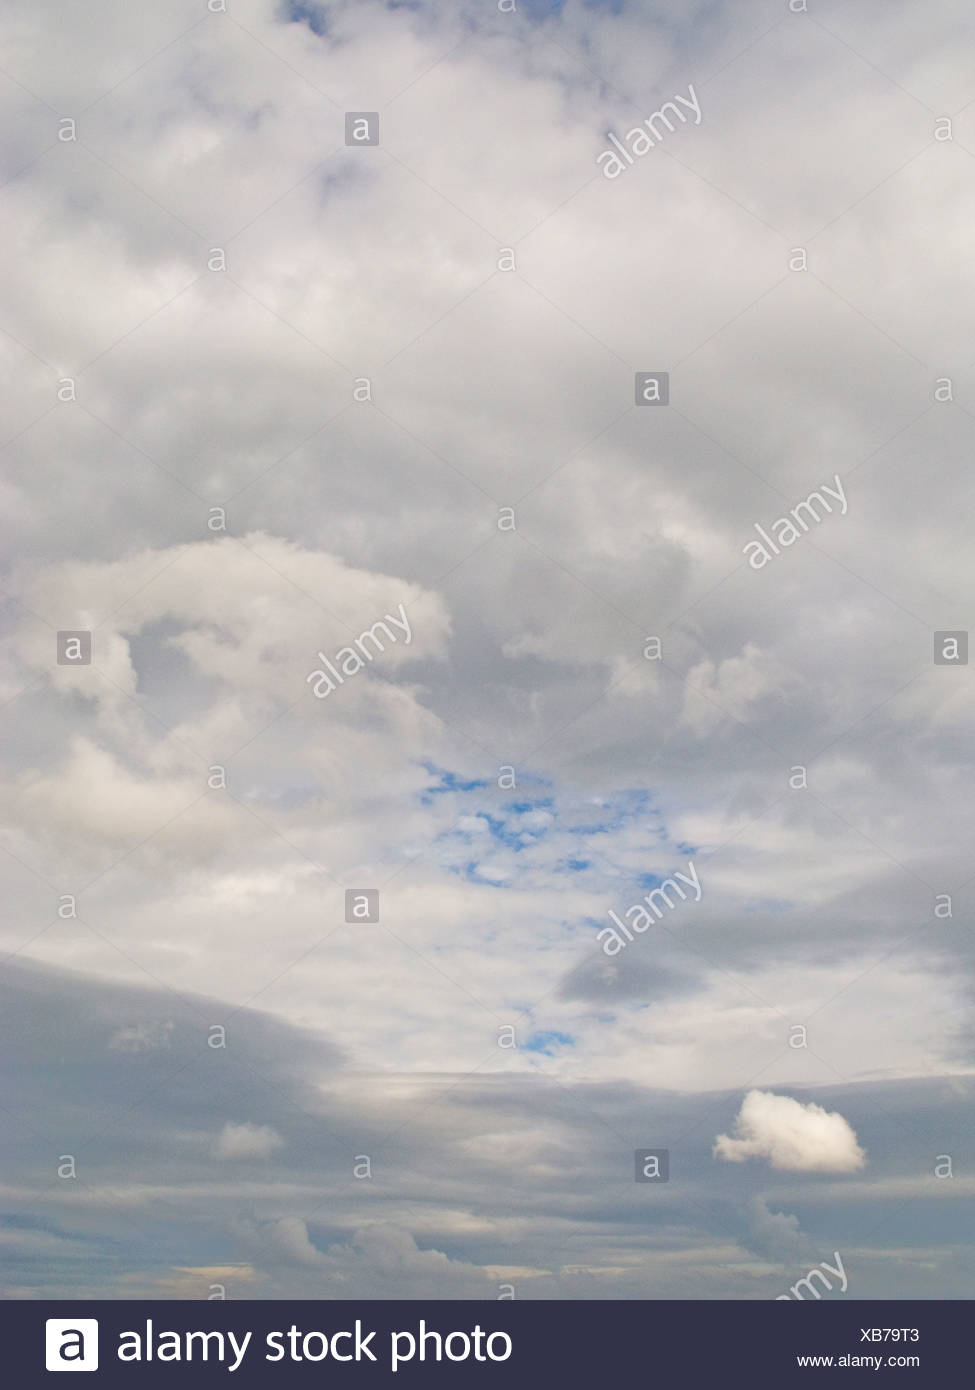 Cloud mass in sky - Stock Image